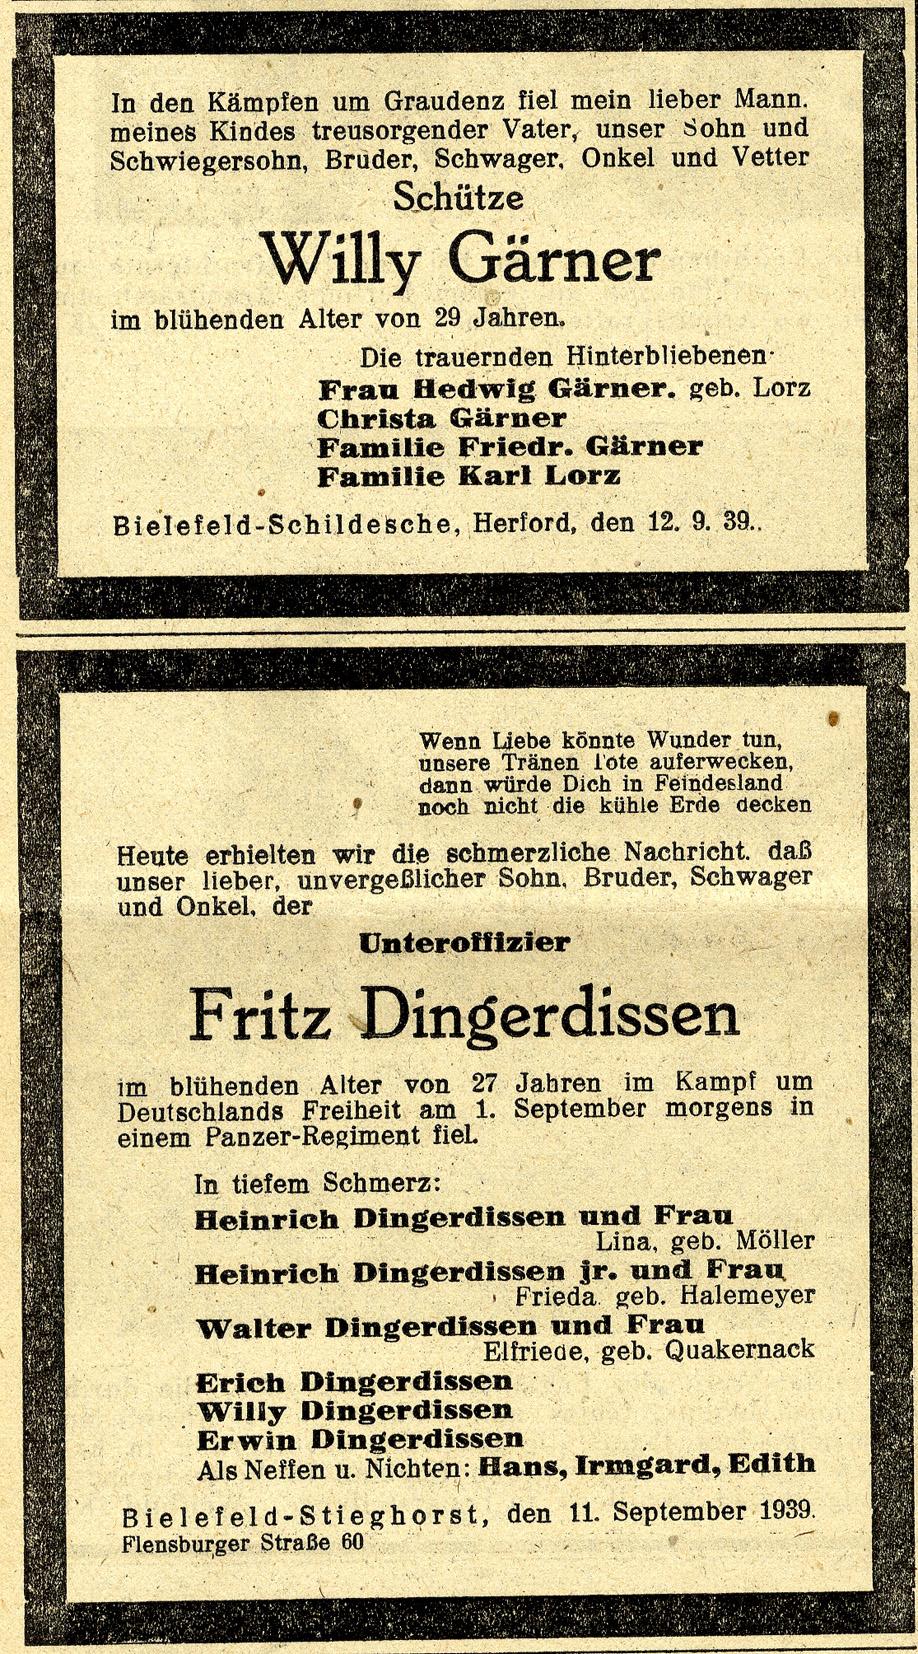 https://historischerrueckklickbielefeld.files.wordpress.com/2009/09/010920098.jpg